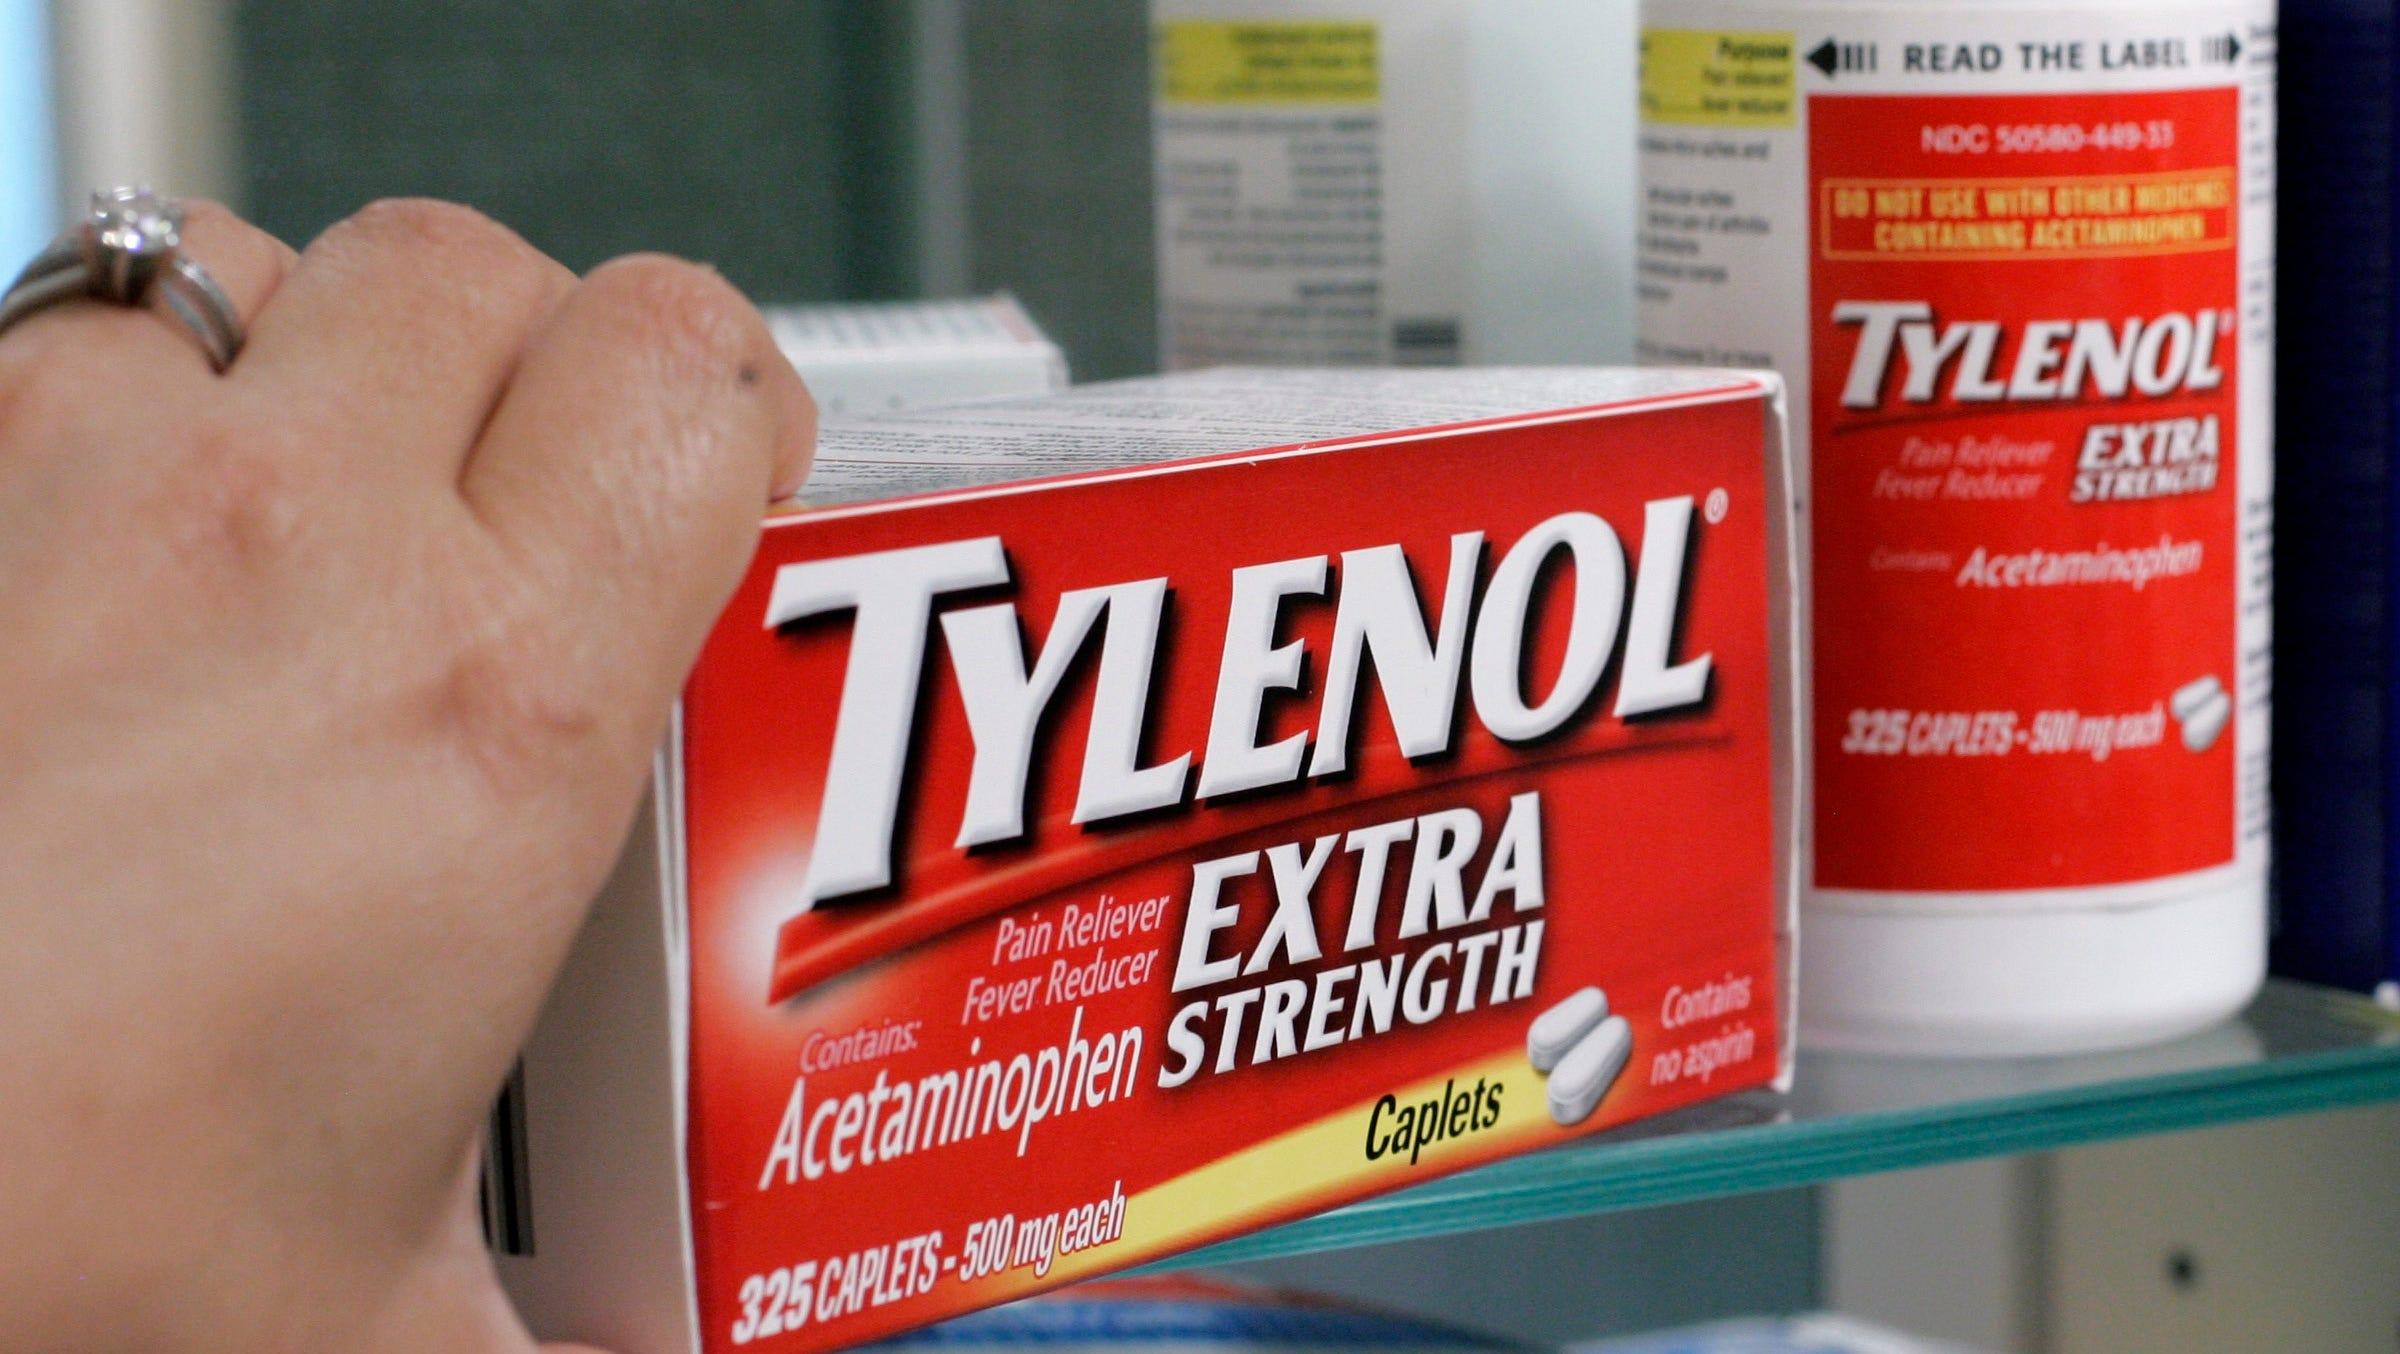 Tylenol A Cancer Risk California Considers Acetaminophen Warning